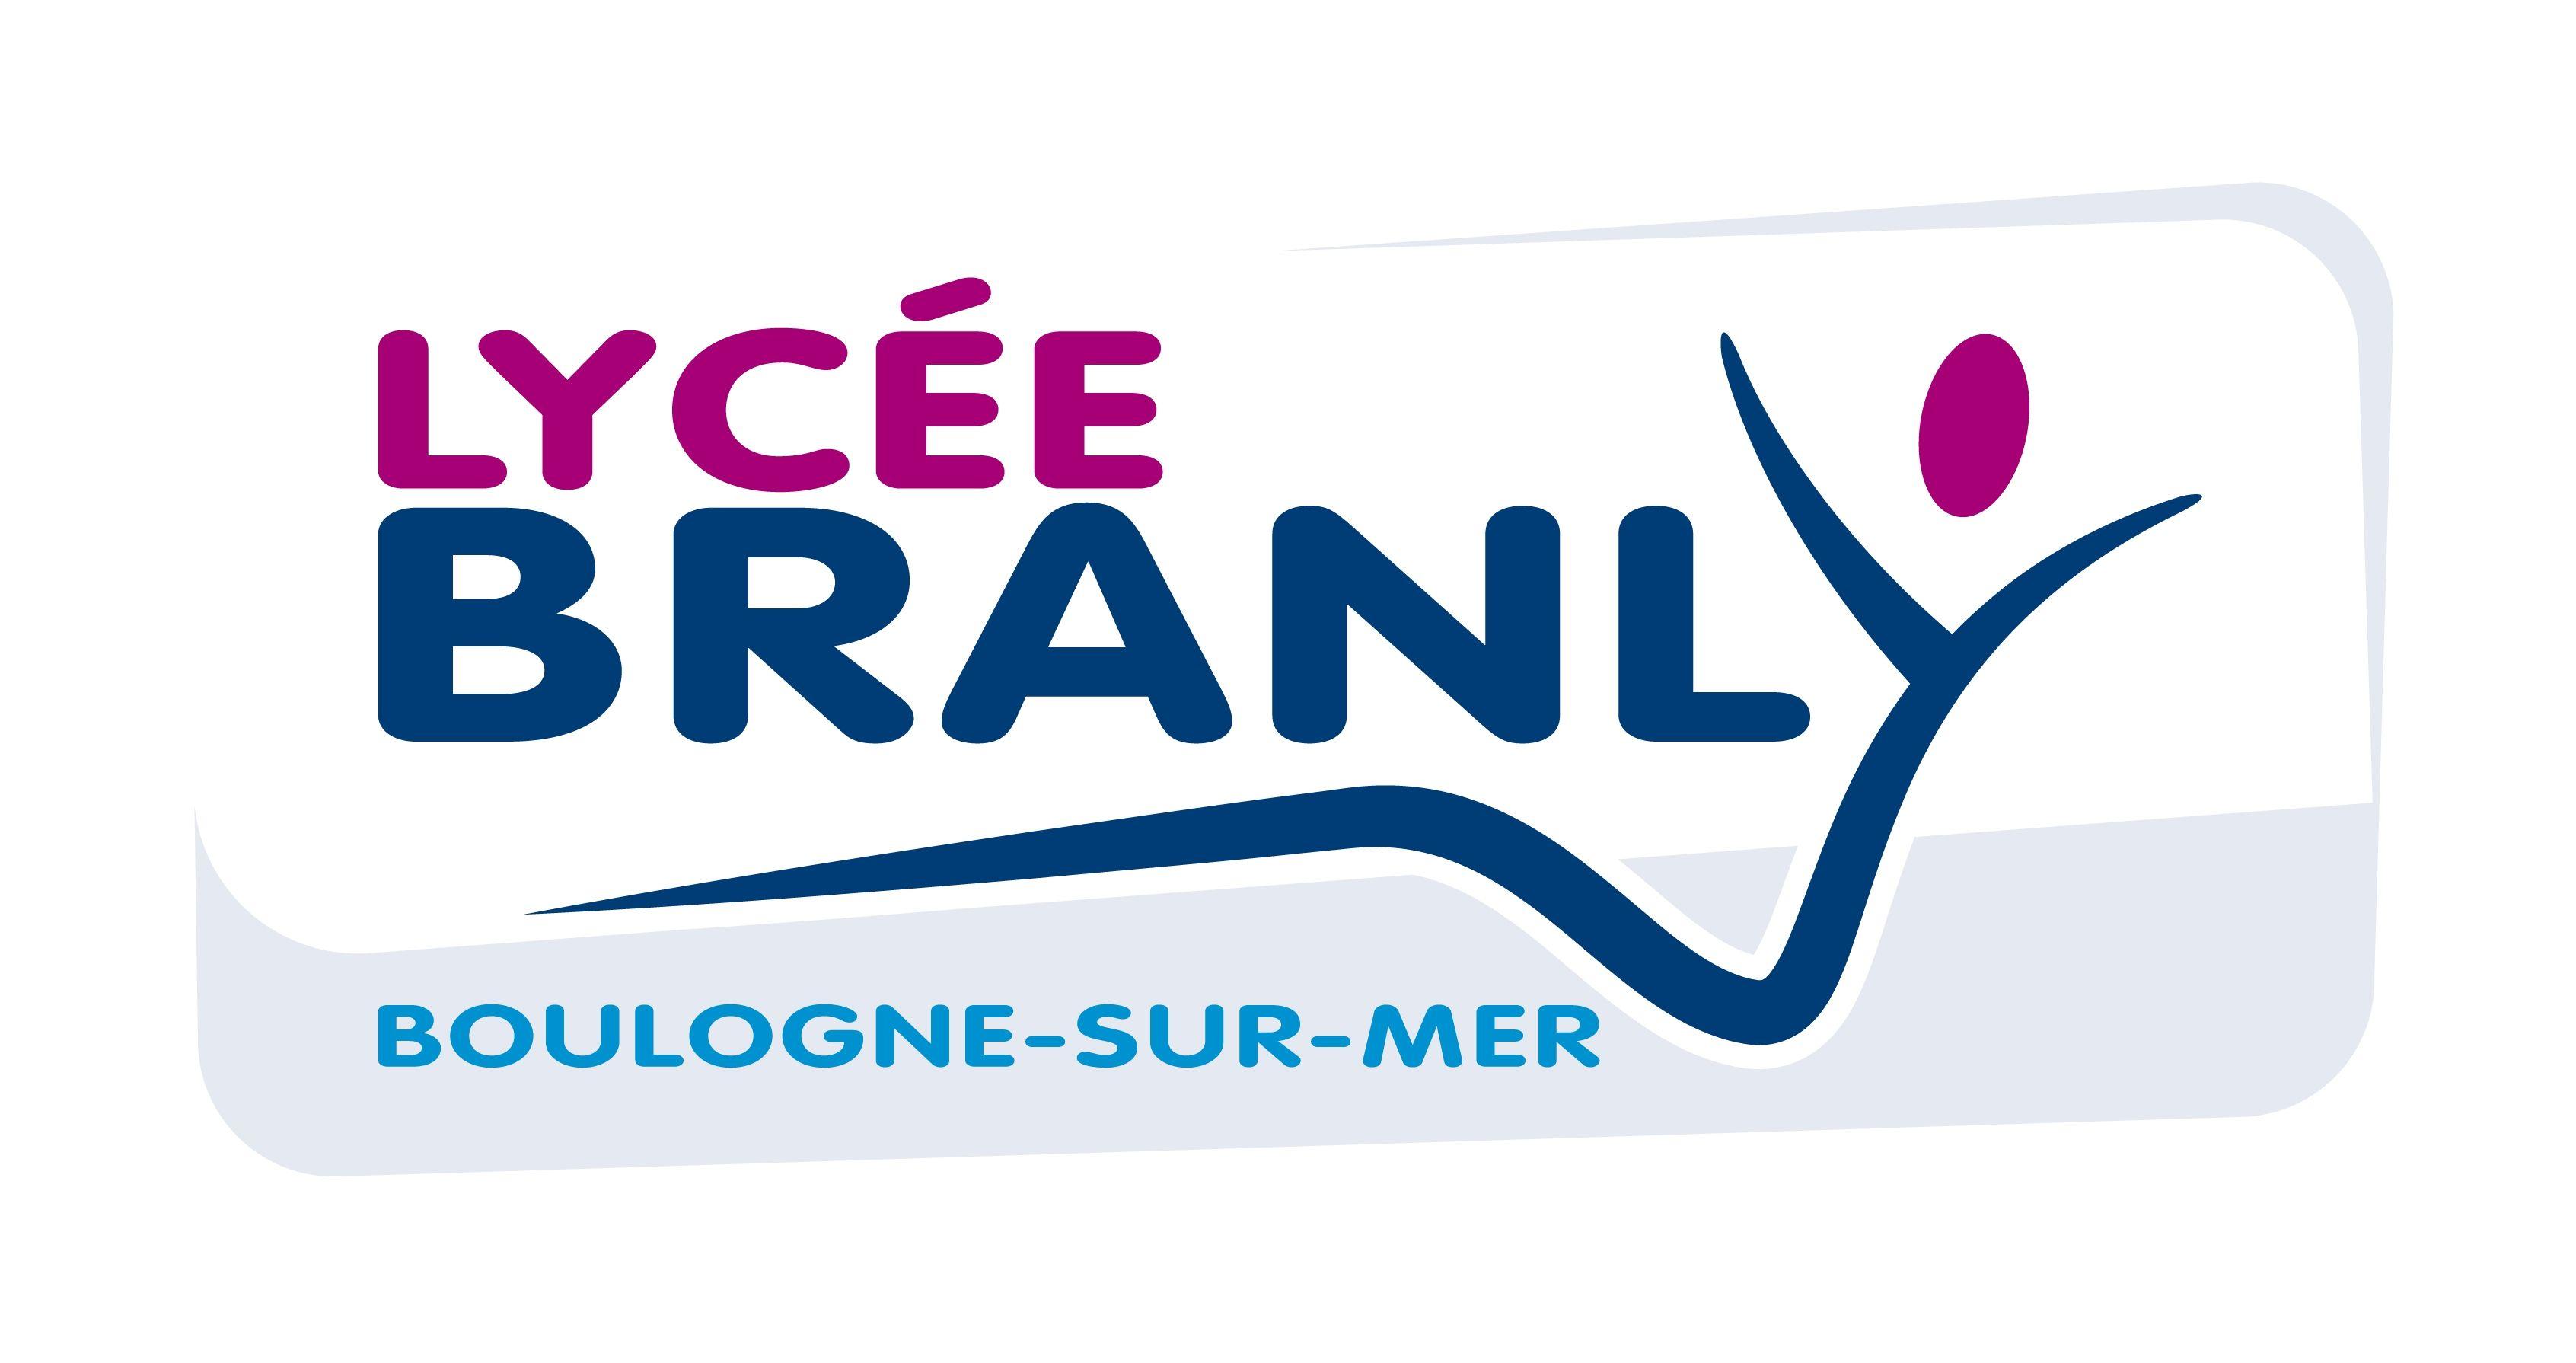 LYCEE EDOUARD BRANLY